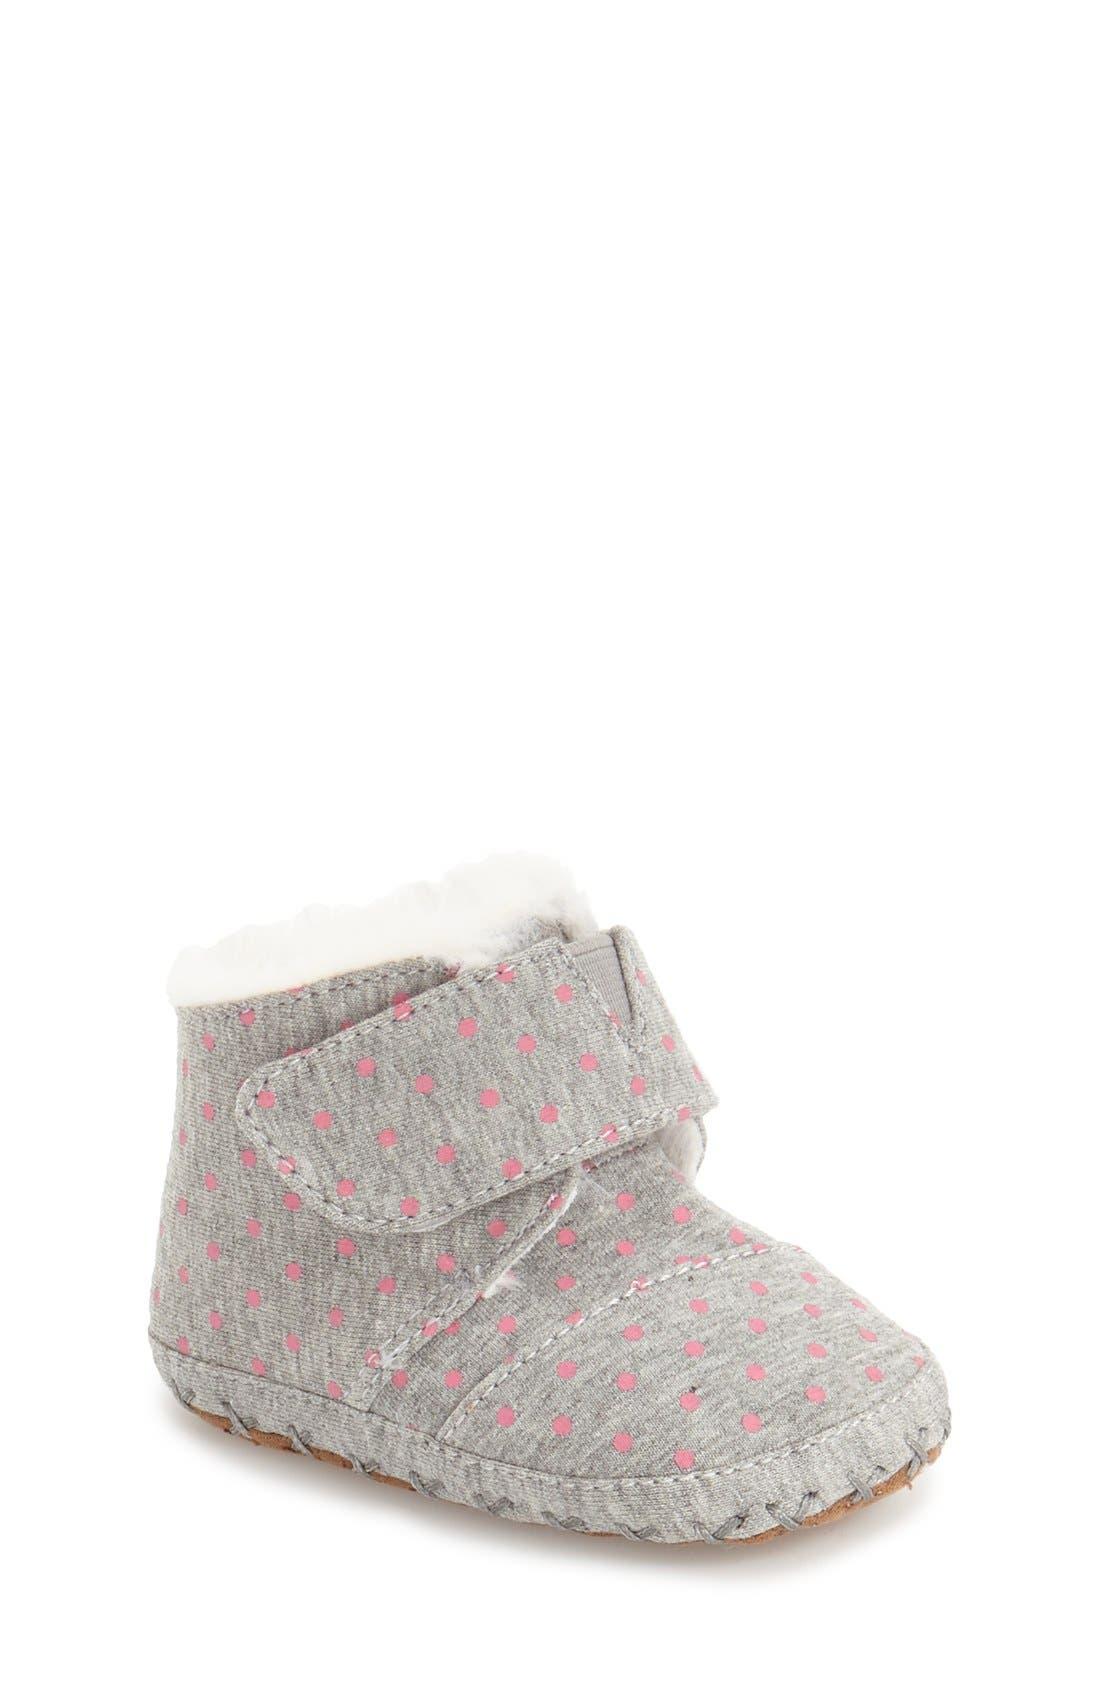 TOMS Cuna Crib Shoe Baby